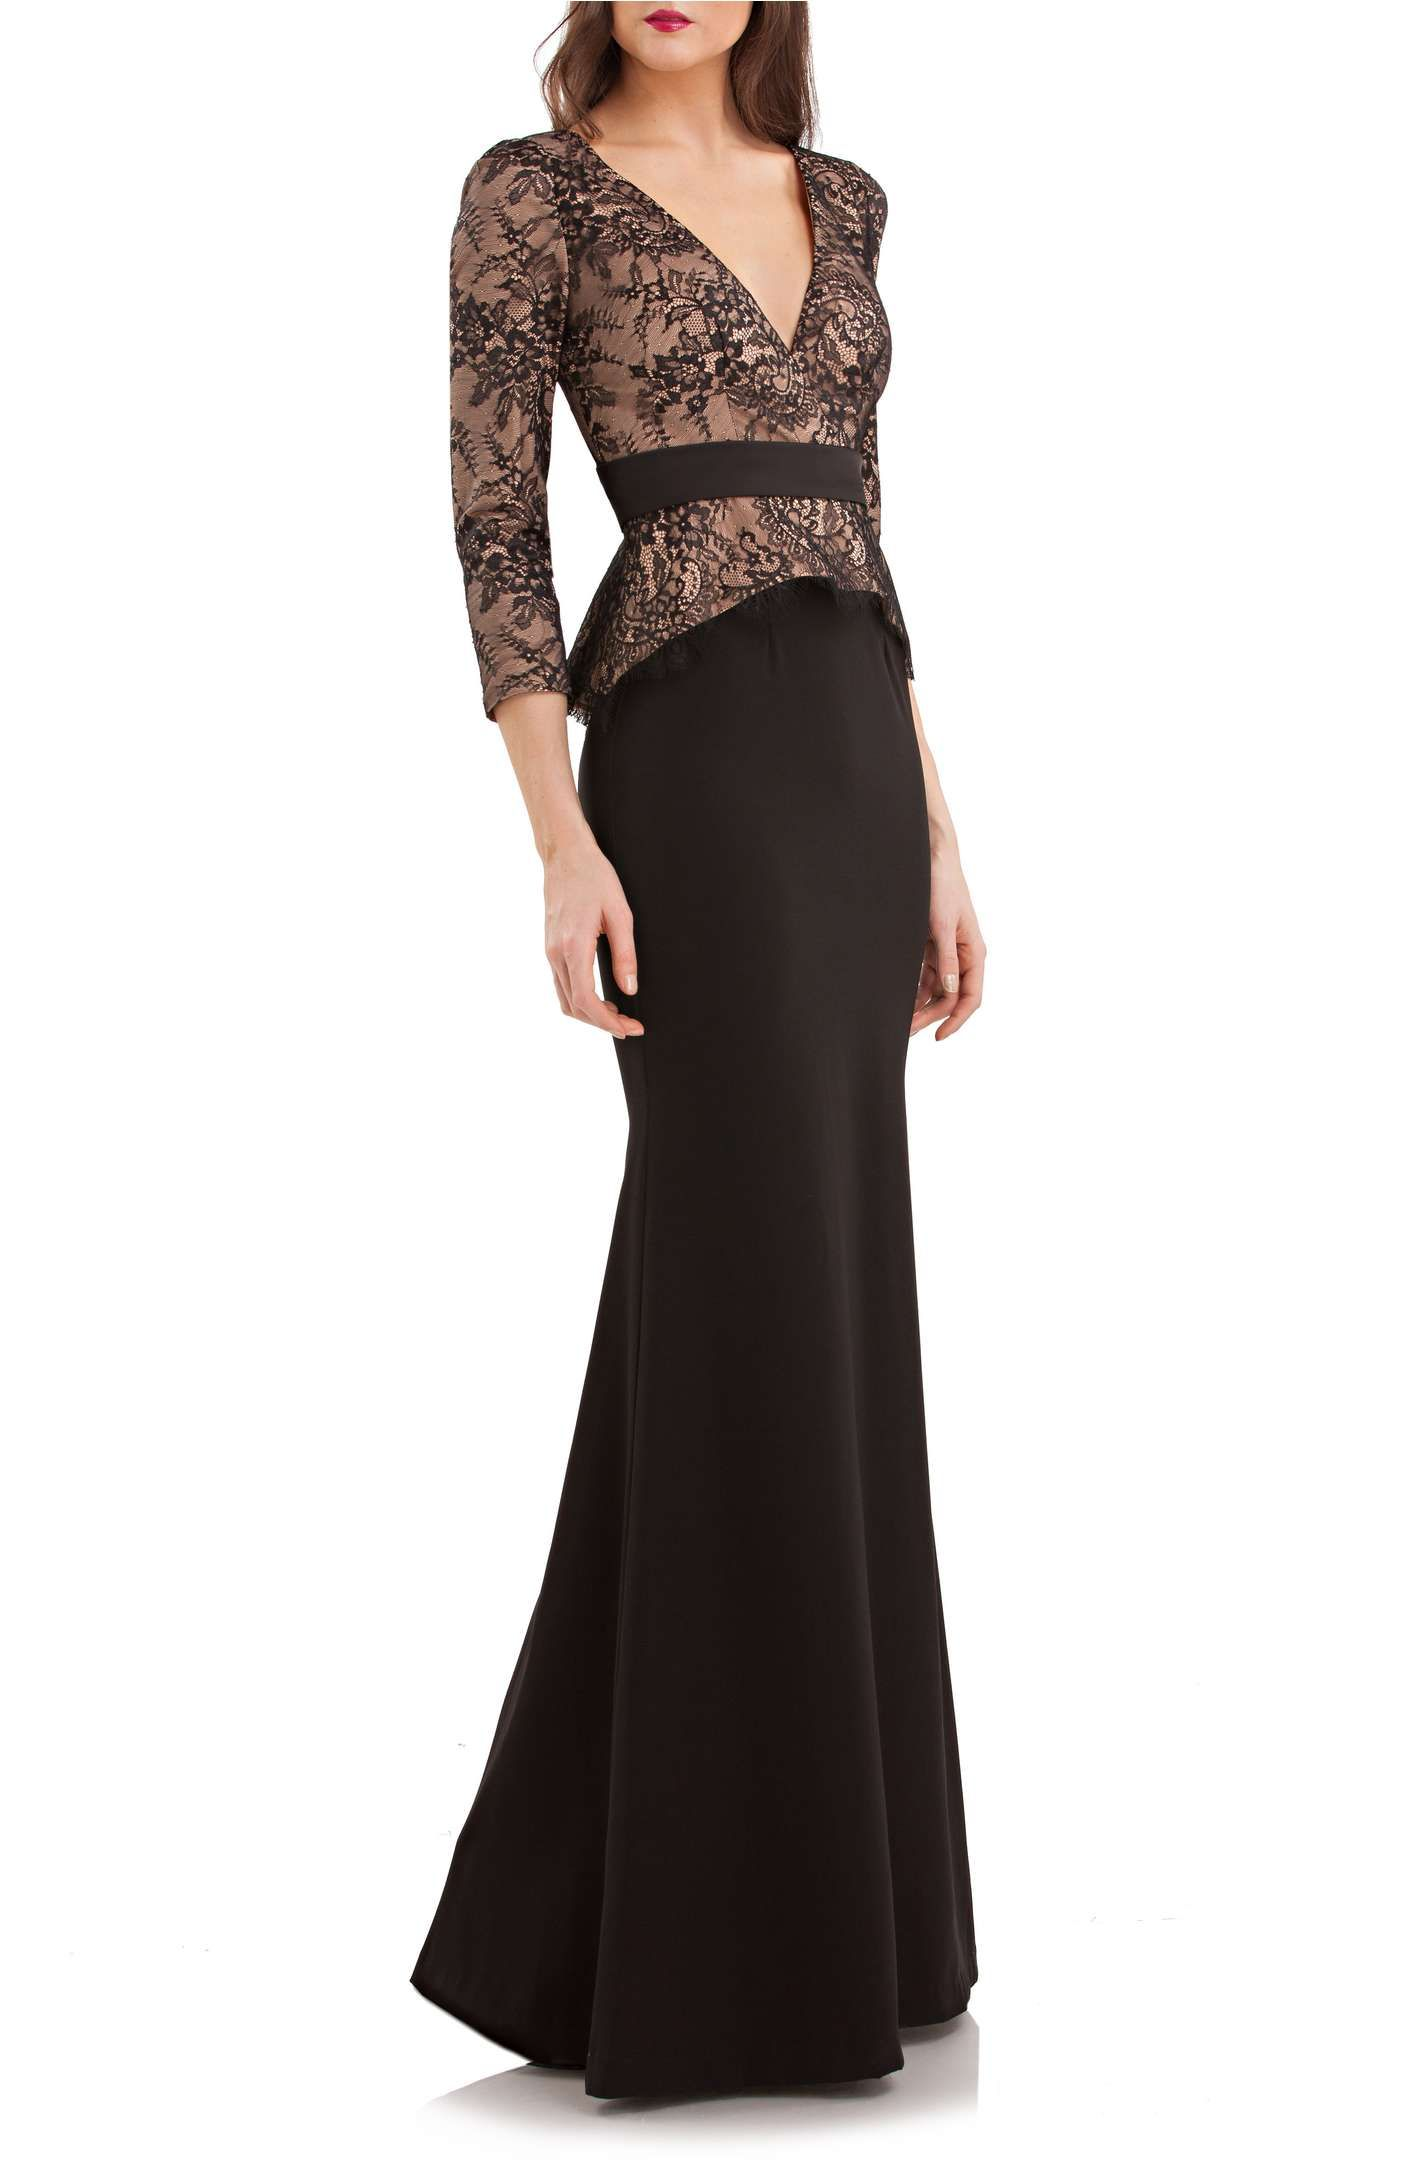 Pin by aqiramdzain on dresses in pinterest gowns peplum